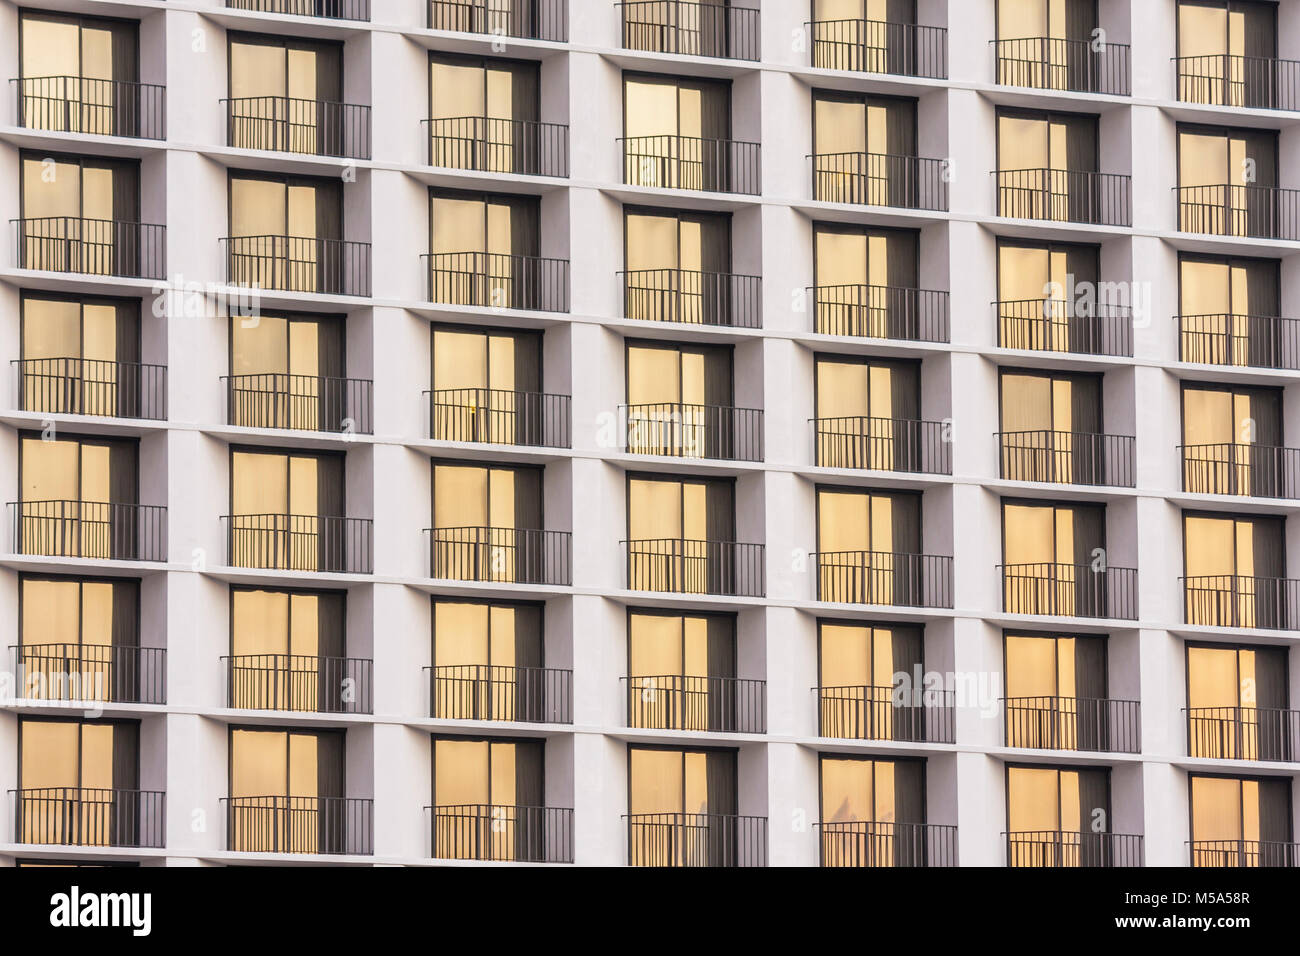 Miami Hyatt Hotel symmetry balconies reflection uniformity high density dwelling sliding glass door - Stock Image